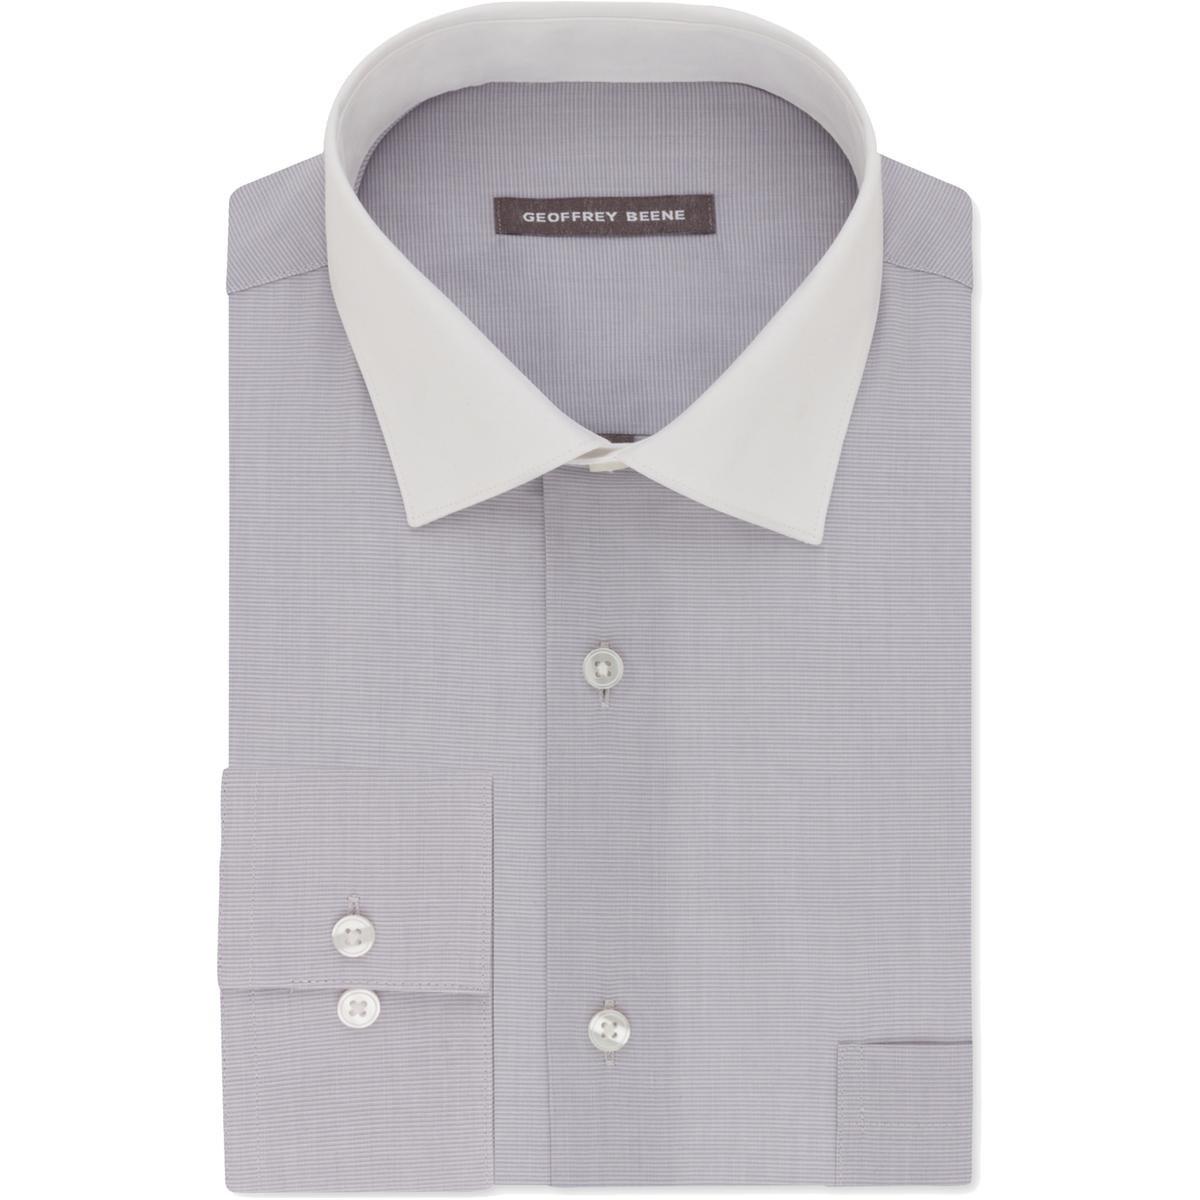 Geoffrey Beene Mens Classic Fit Contrast Trim Dress Shirt Silver S